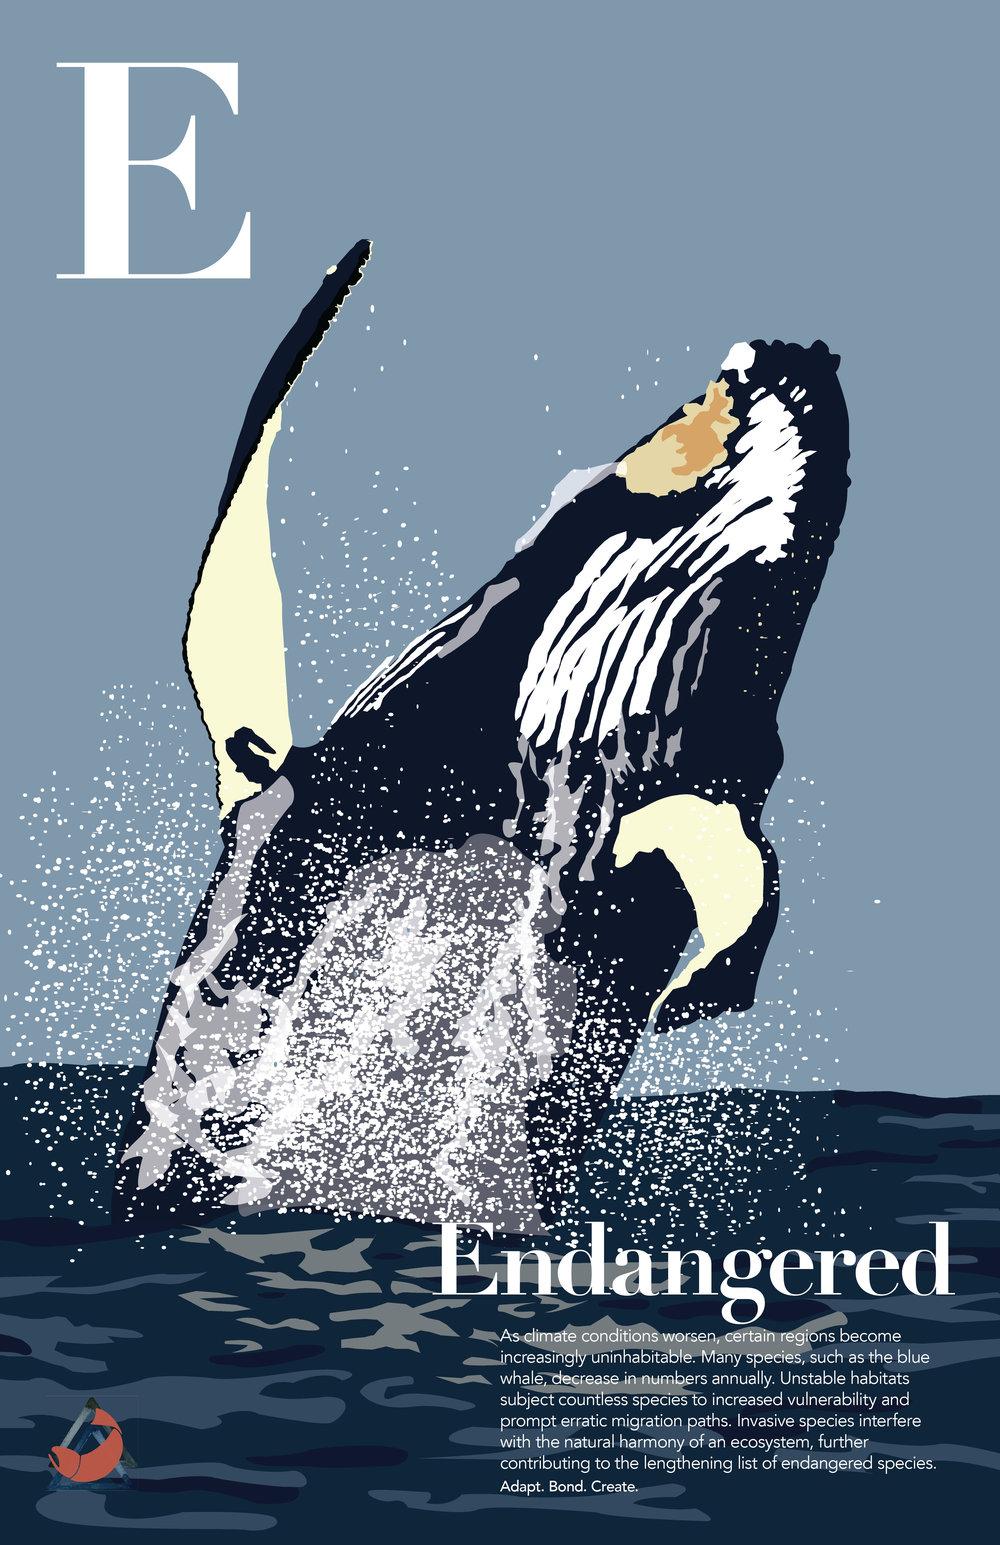 endangered_final copy.jpg